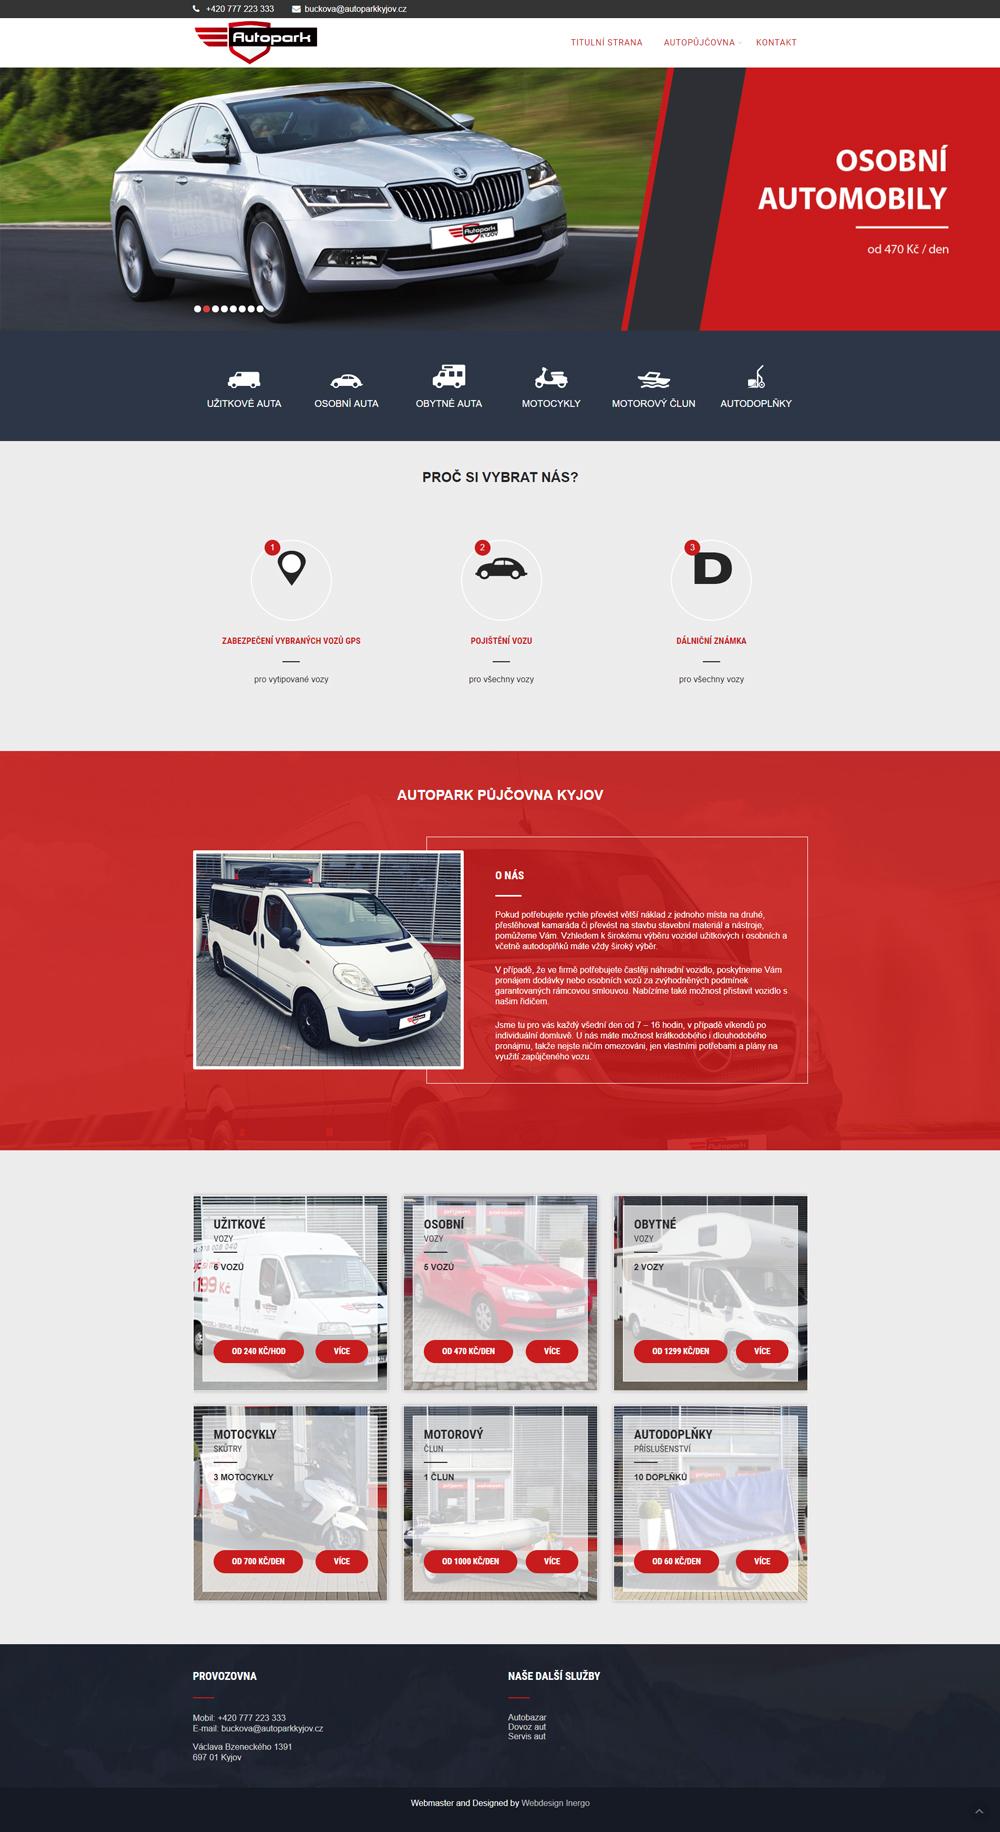 Autopark půjčovna Kyjov - webové stránky